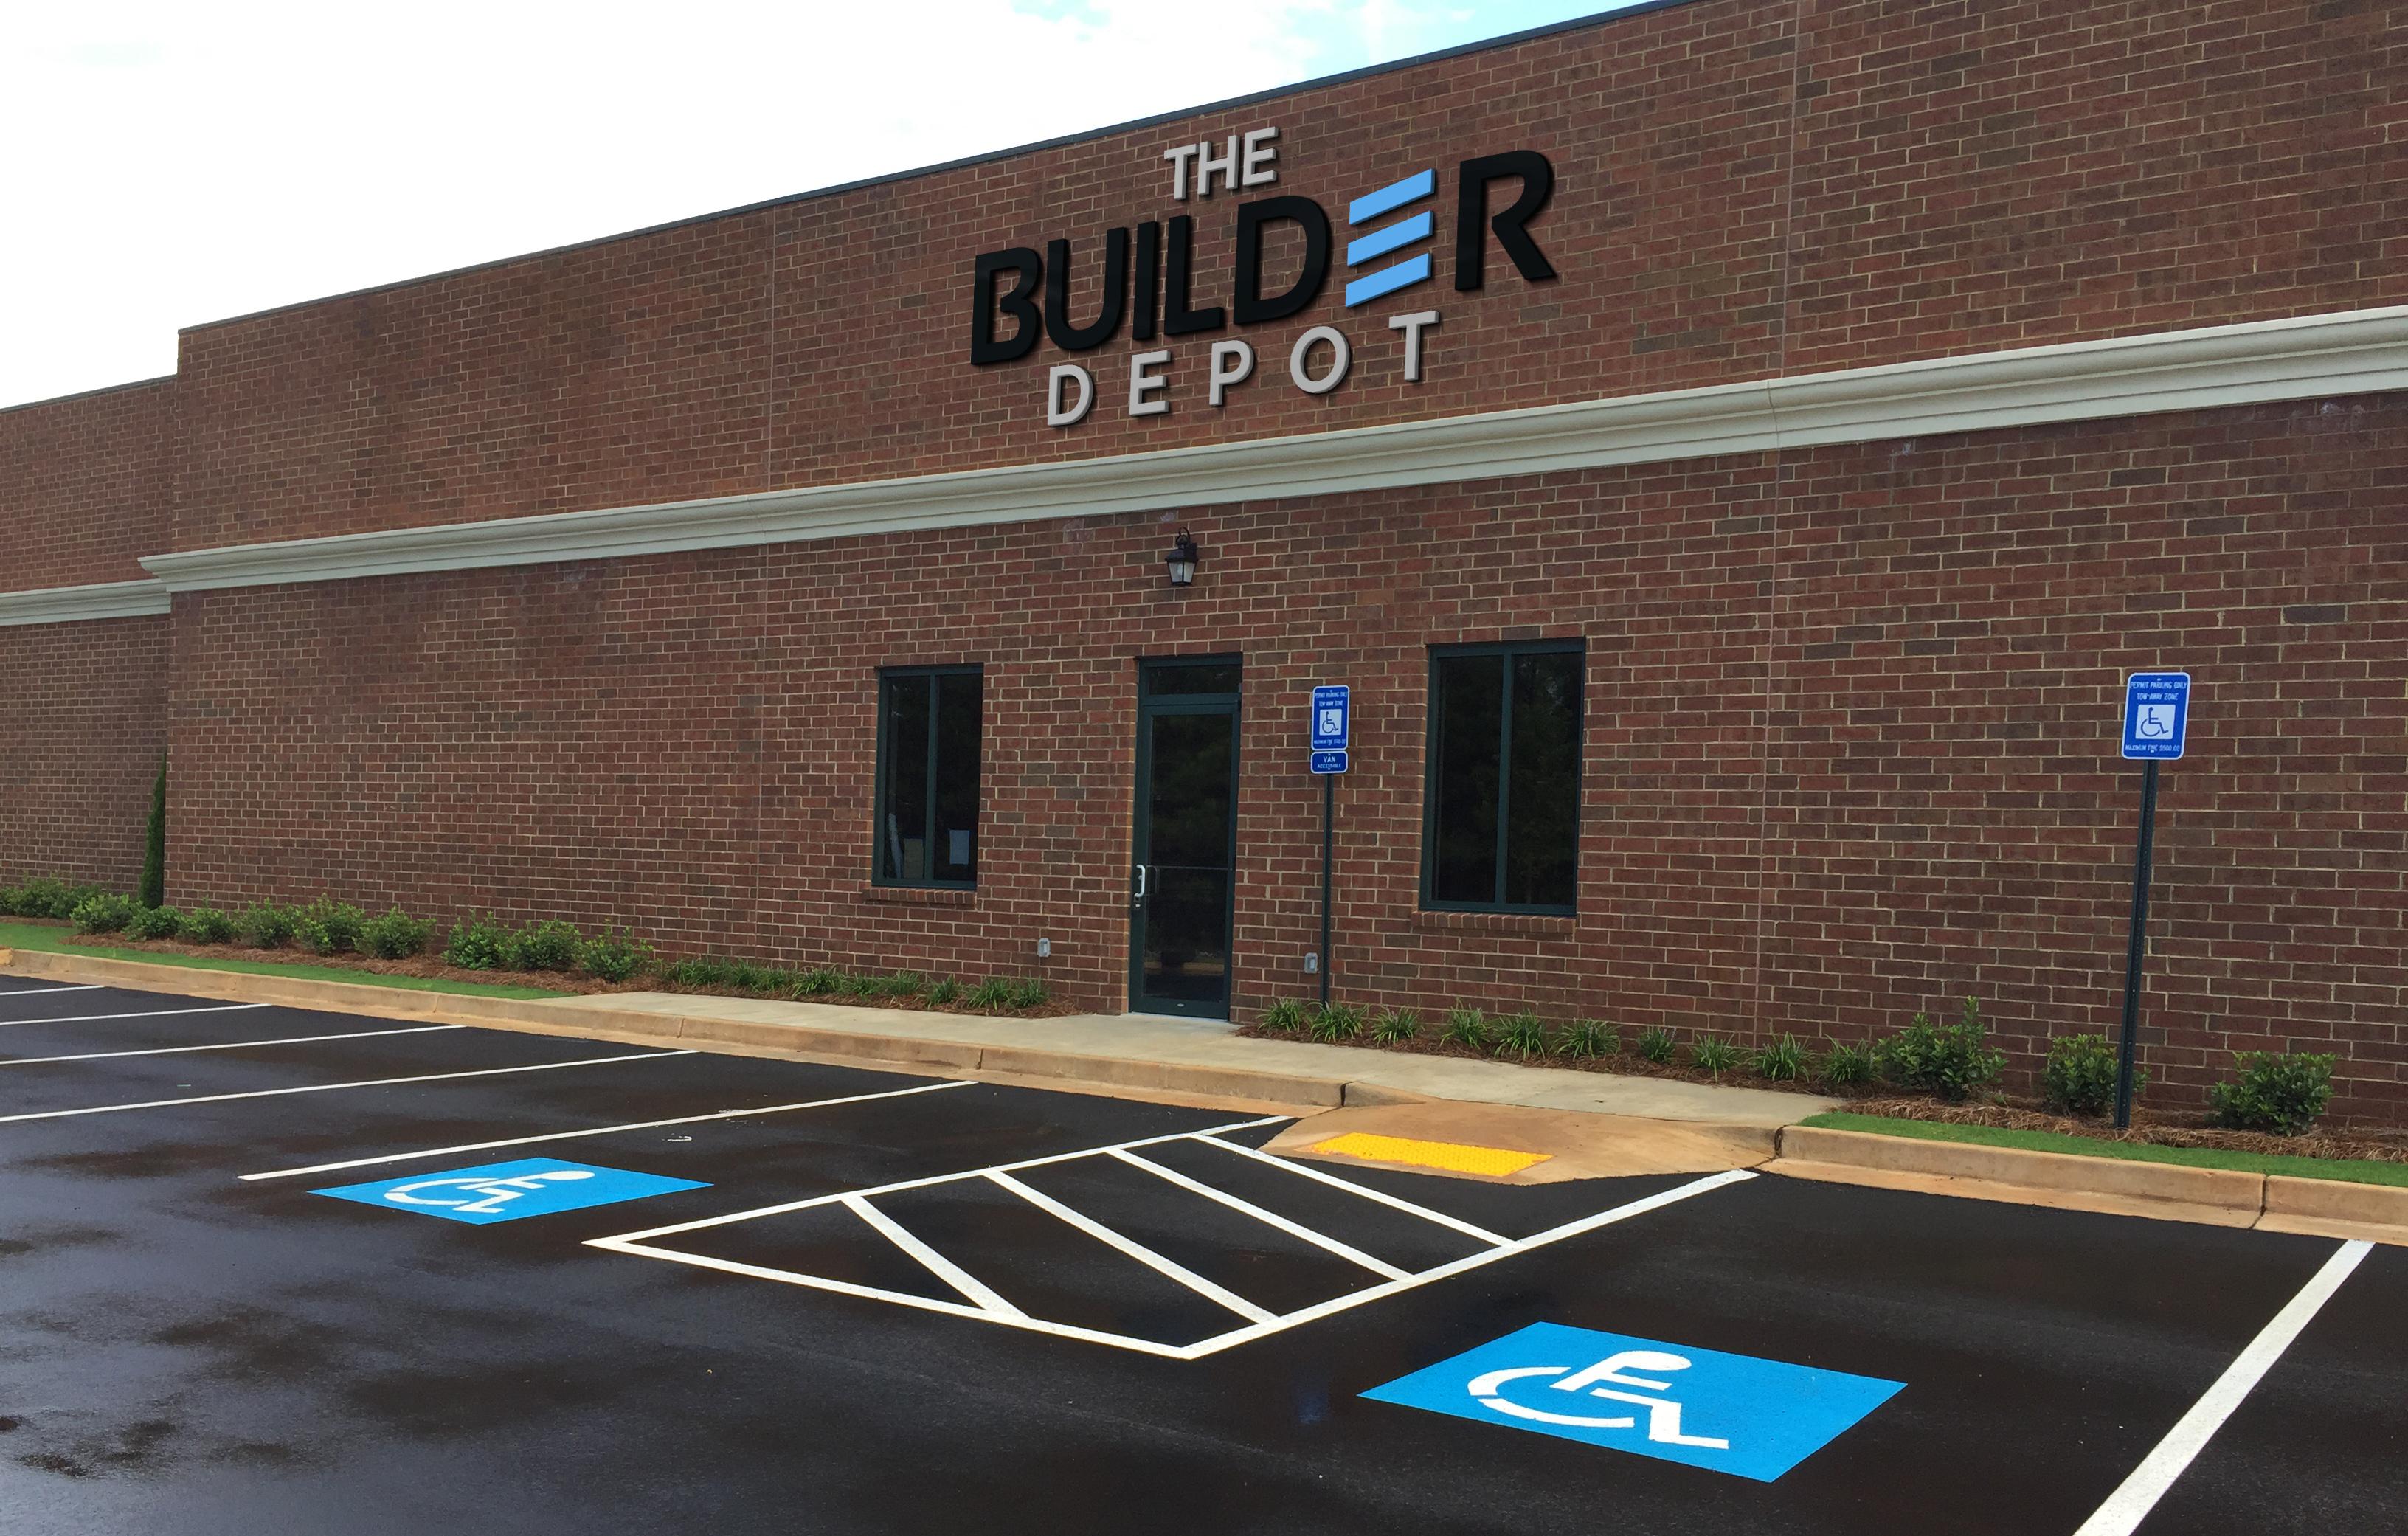 The Builder Depot Building